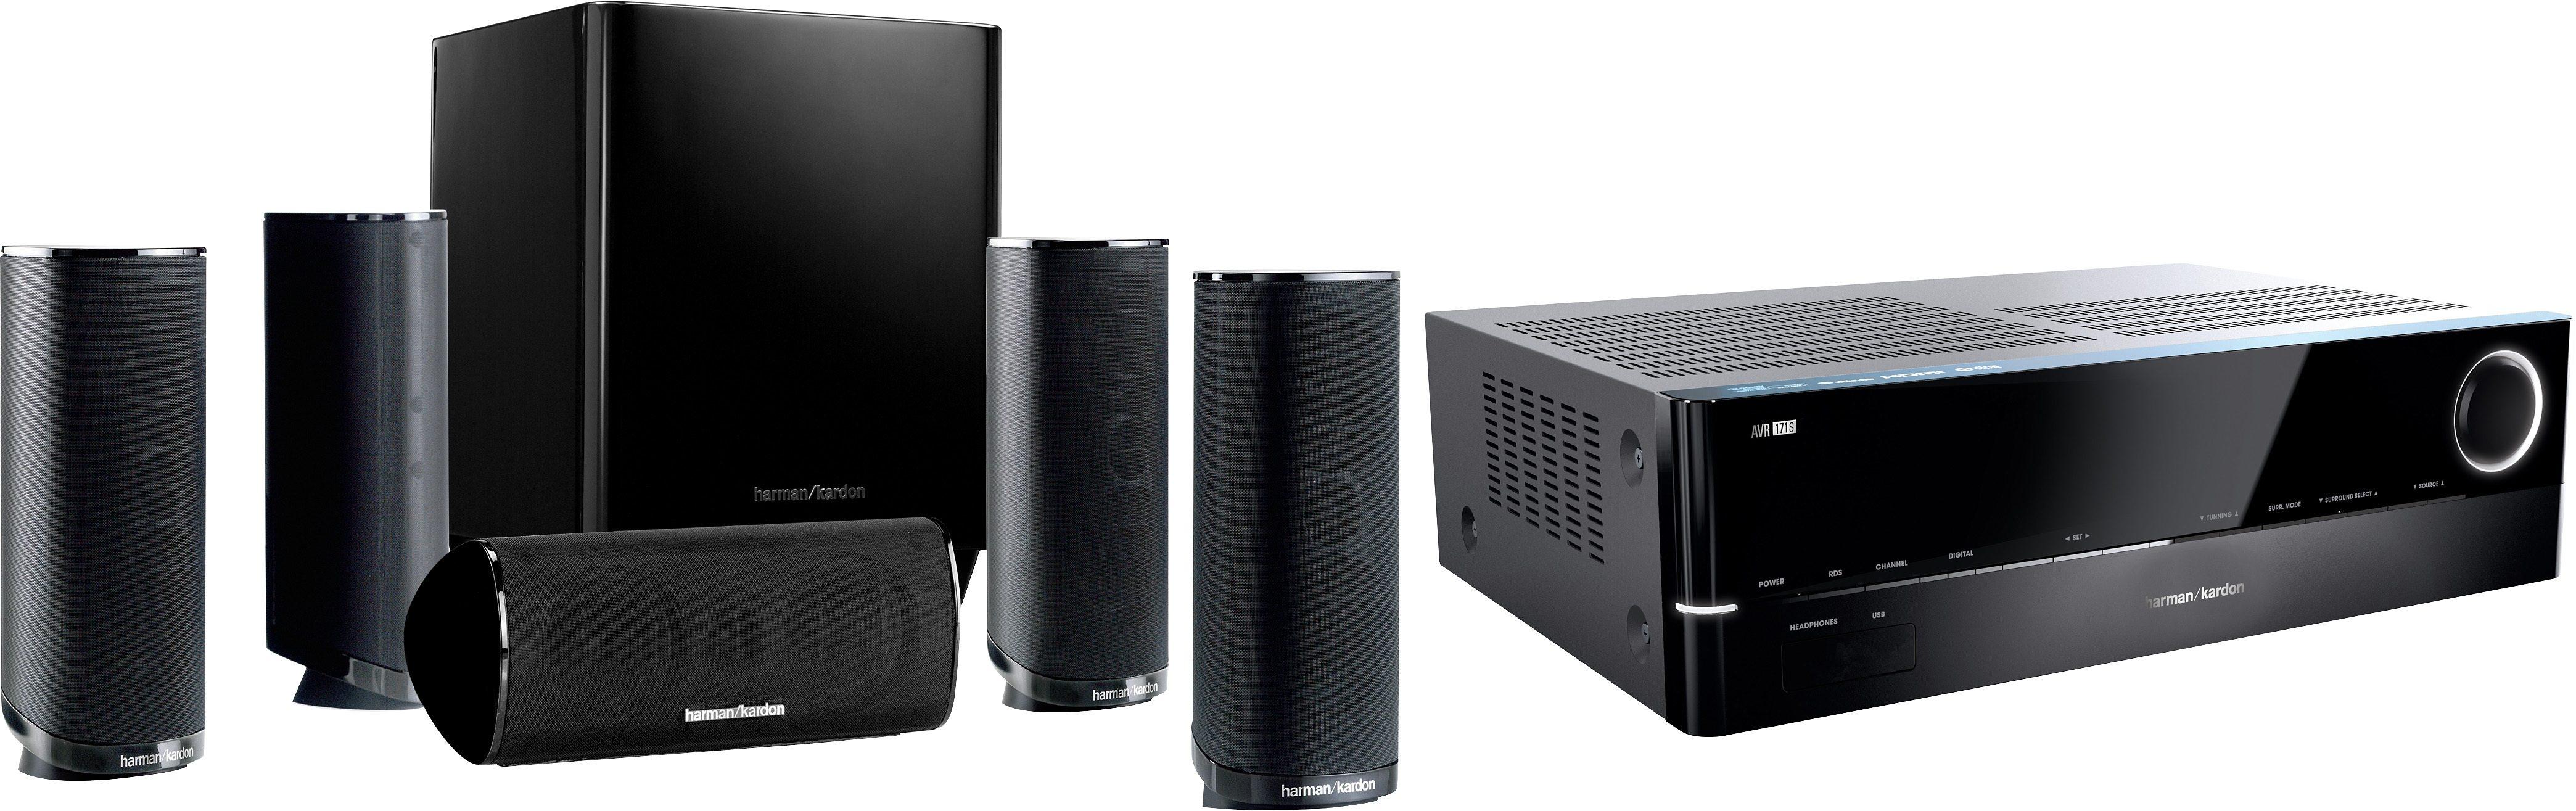 Harman/Kardon »Harman/Kardon HD Com 1716S 5.1 Heimkinosystem (700 W, Bluetooth, Spotify)« 5.1 Heimkinosystem (700 Watt, 3D-fähig)